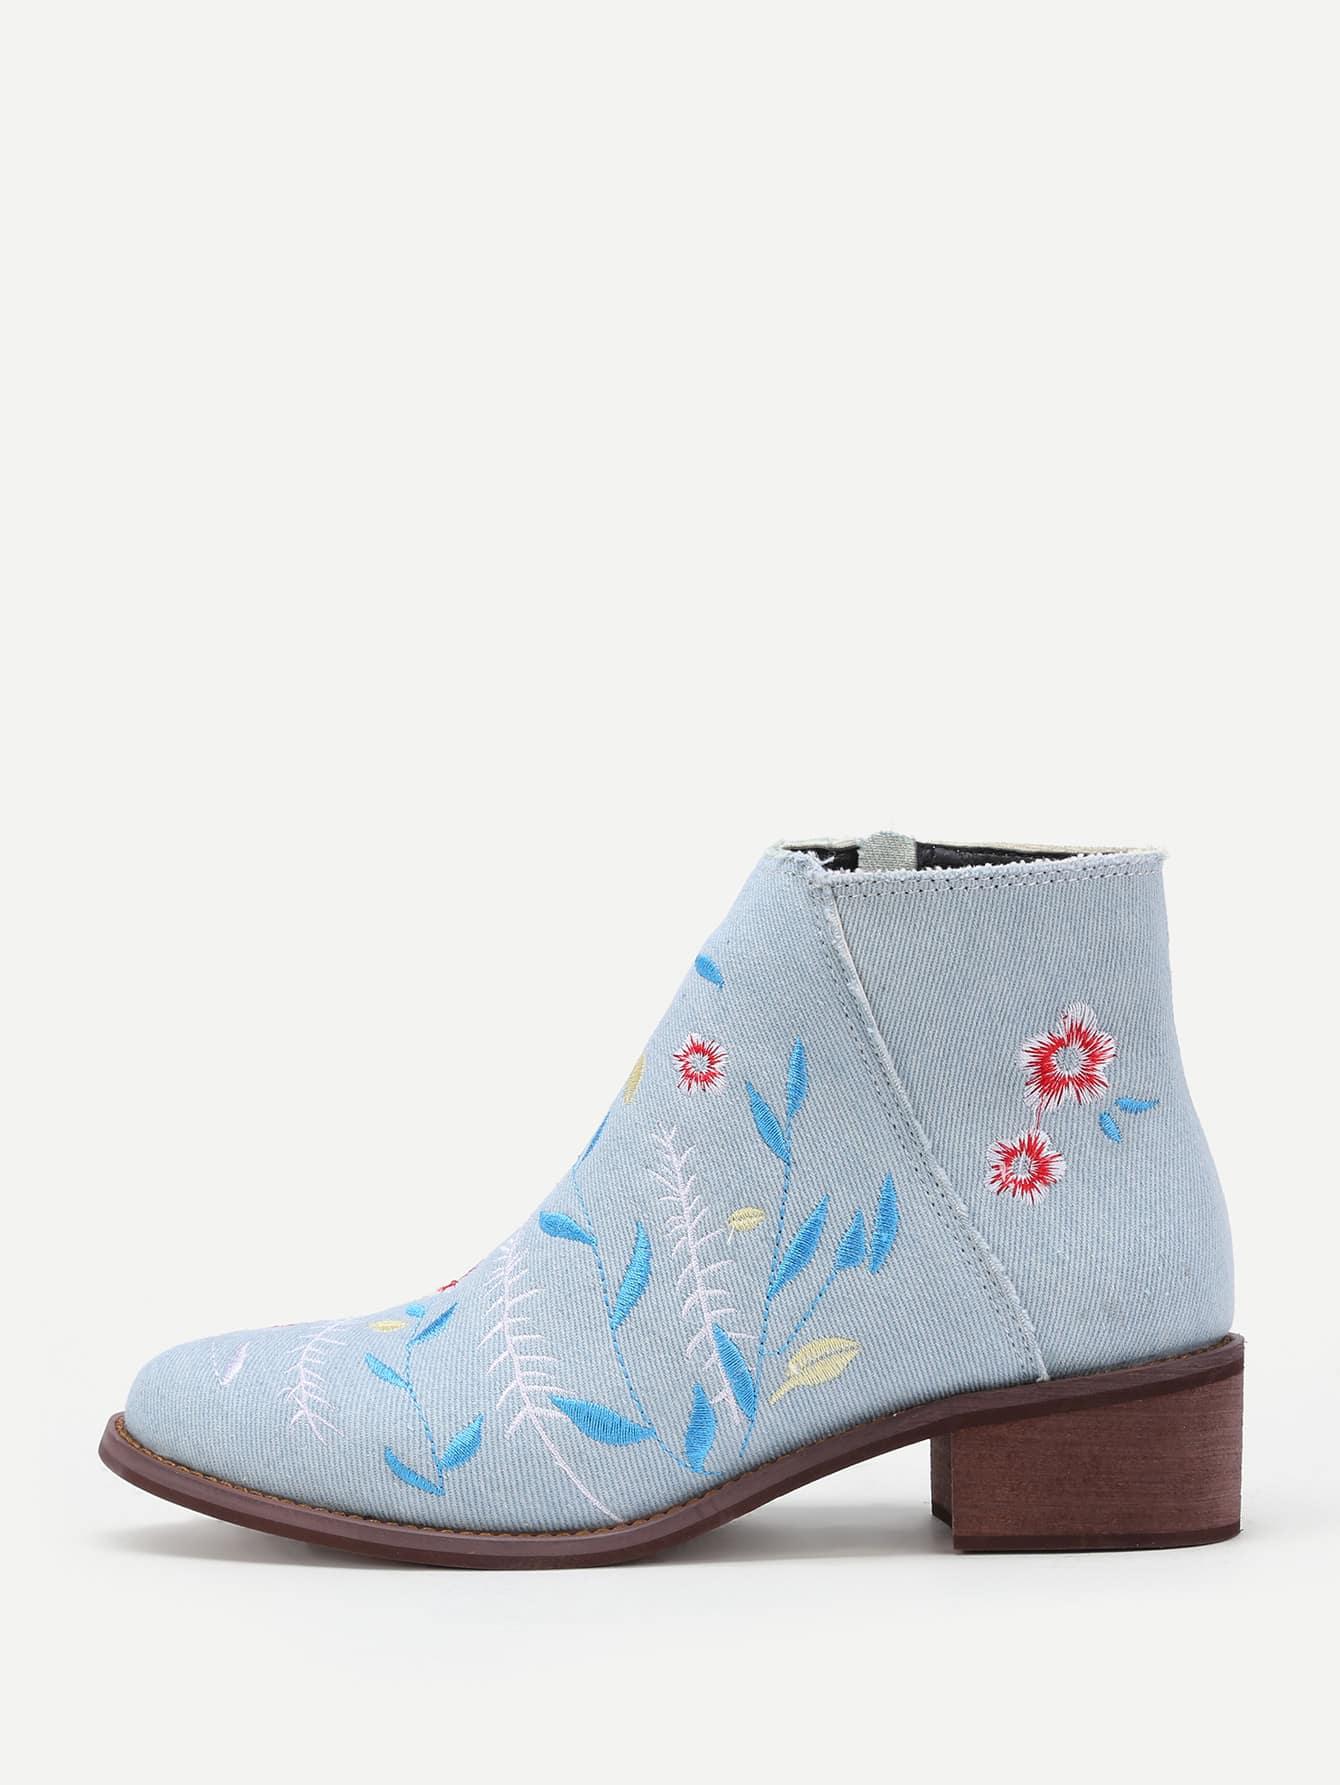 Flower Embroidery Denim Block Heeled Ankle Boots rhinestone flower embellished heeled boots